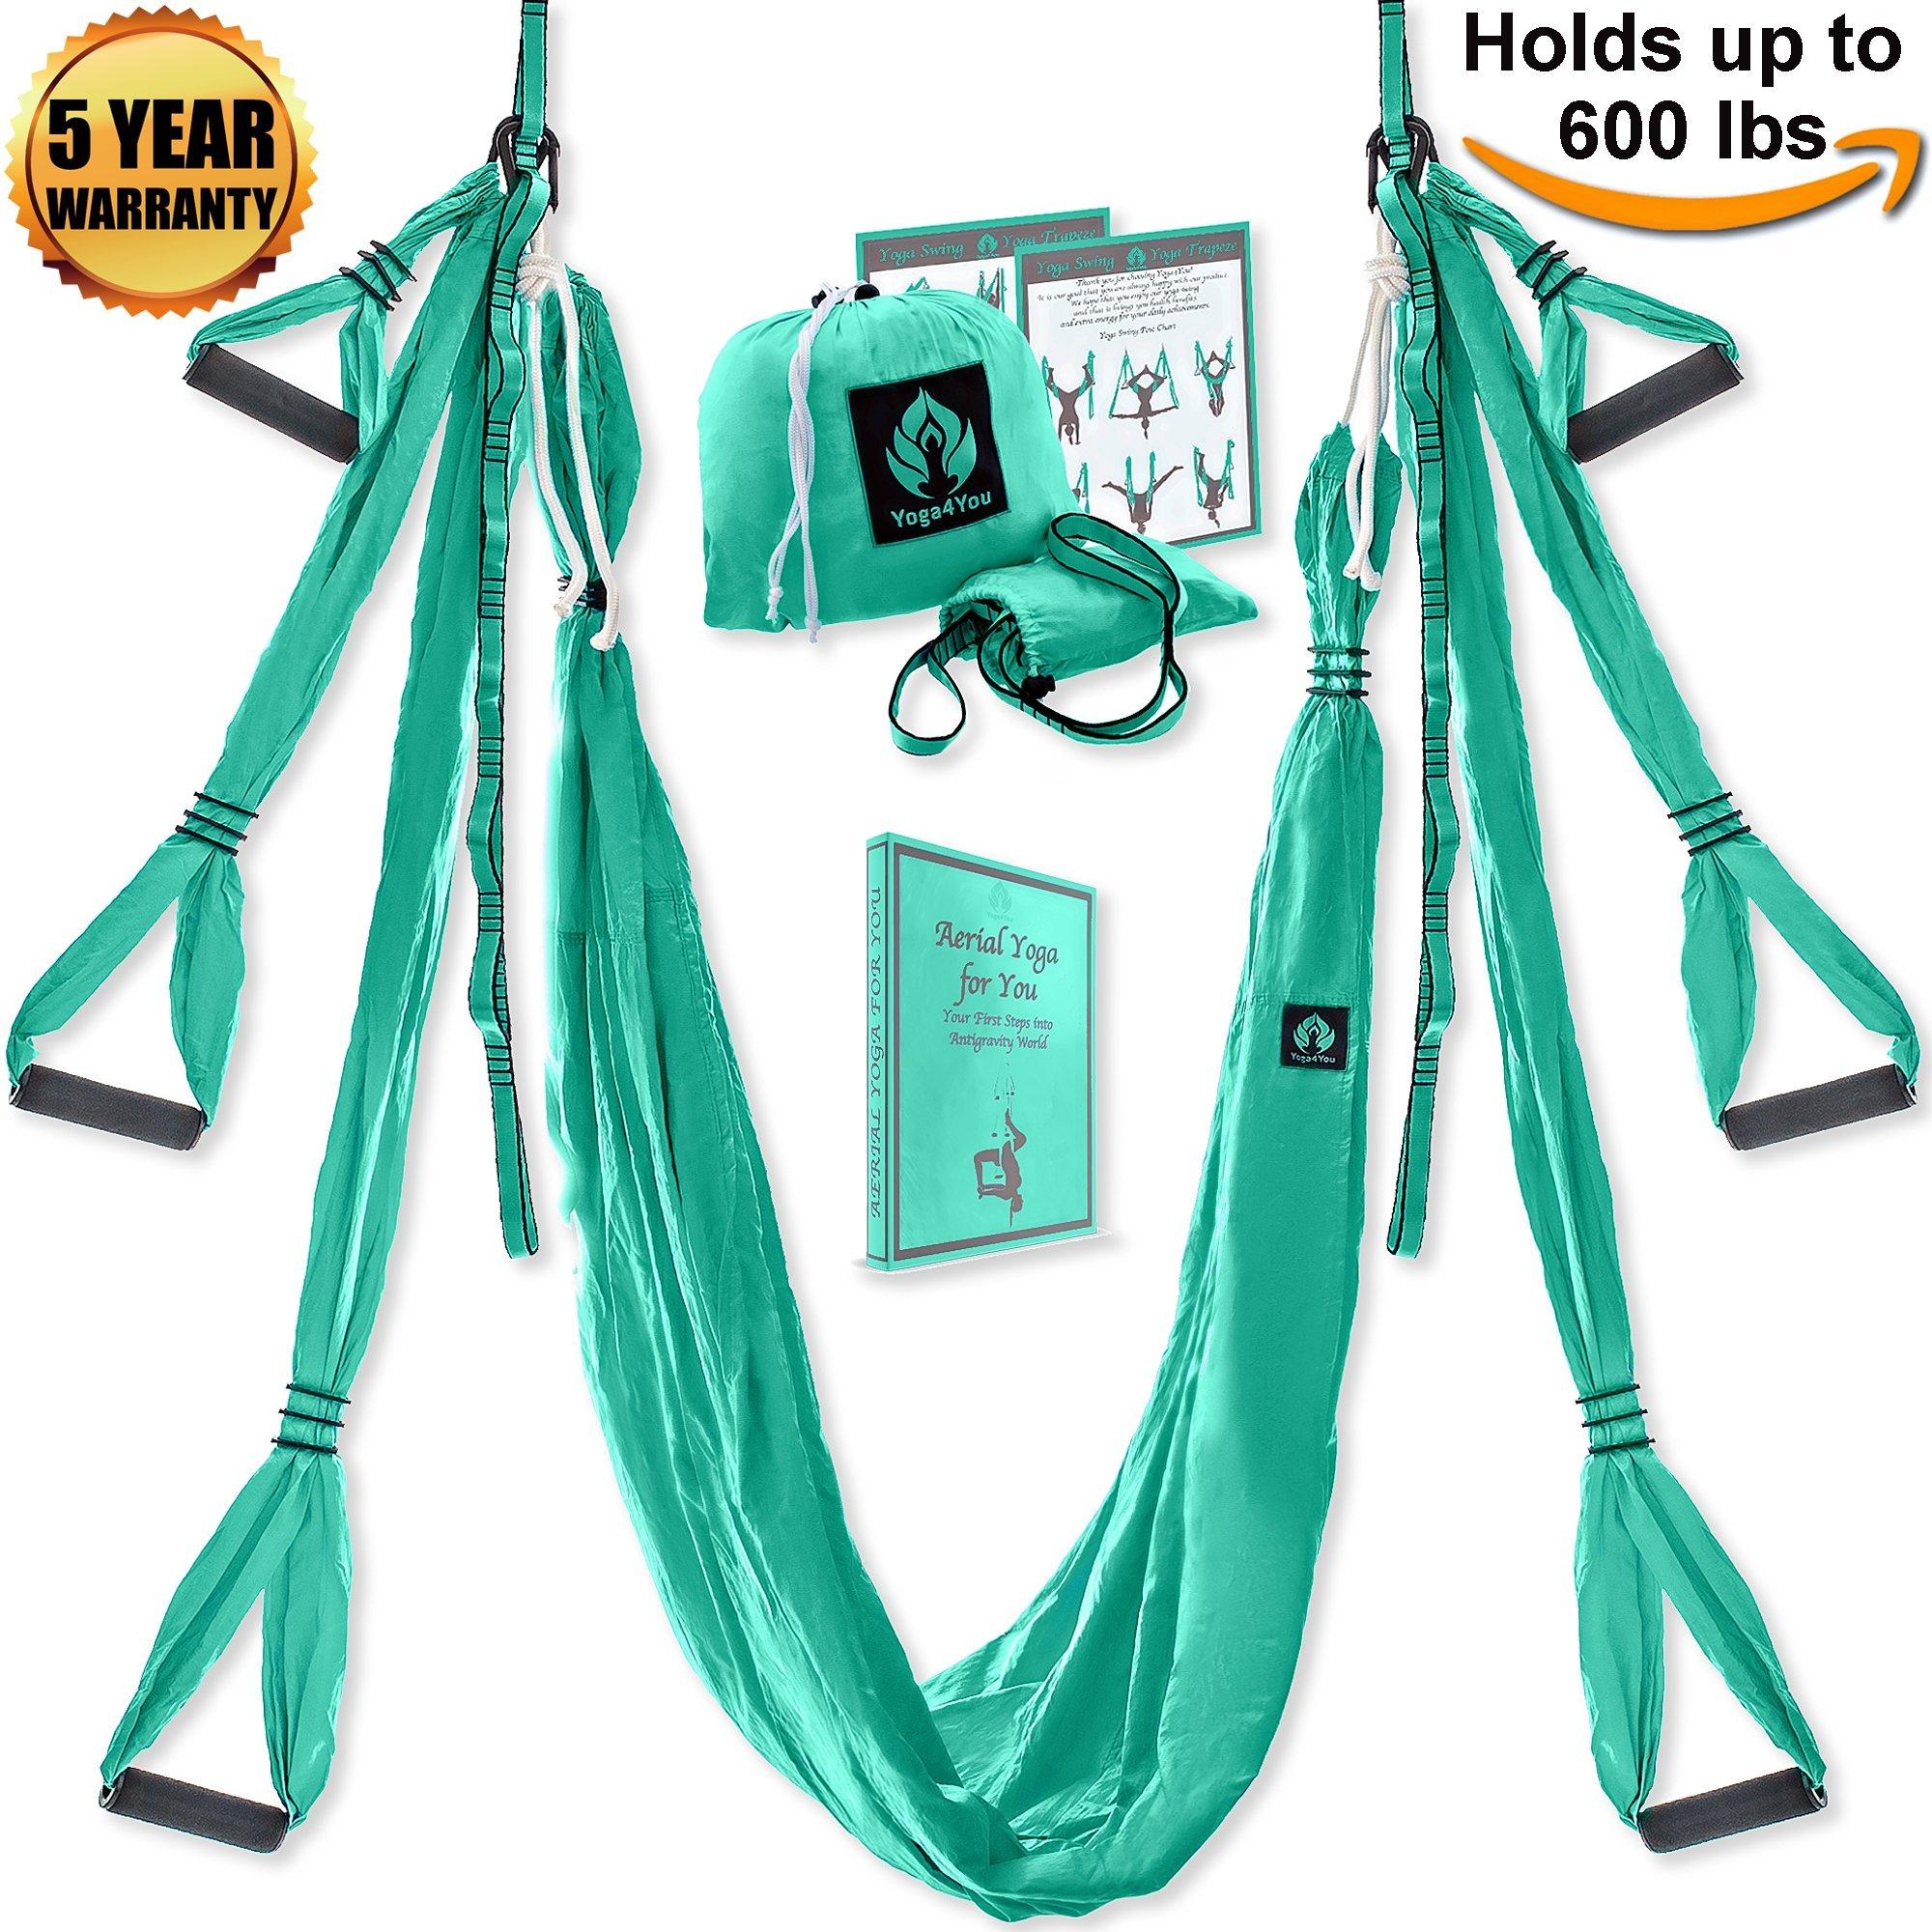 Aerial Yoga Swing Set - Yoga Hammock - Aerial Trapeze Kit + 2 Extension Straps & eBook - Large Flying Yoga Inversion Tool - Anti-Gravity Hanging Yoga Sling - Indoor Outdoor Fly Yoga - Men Women Kids